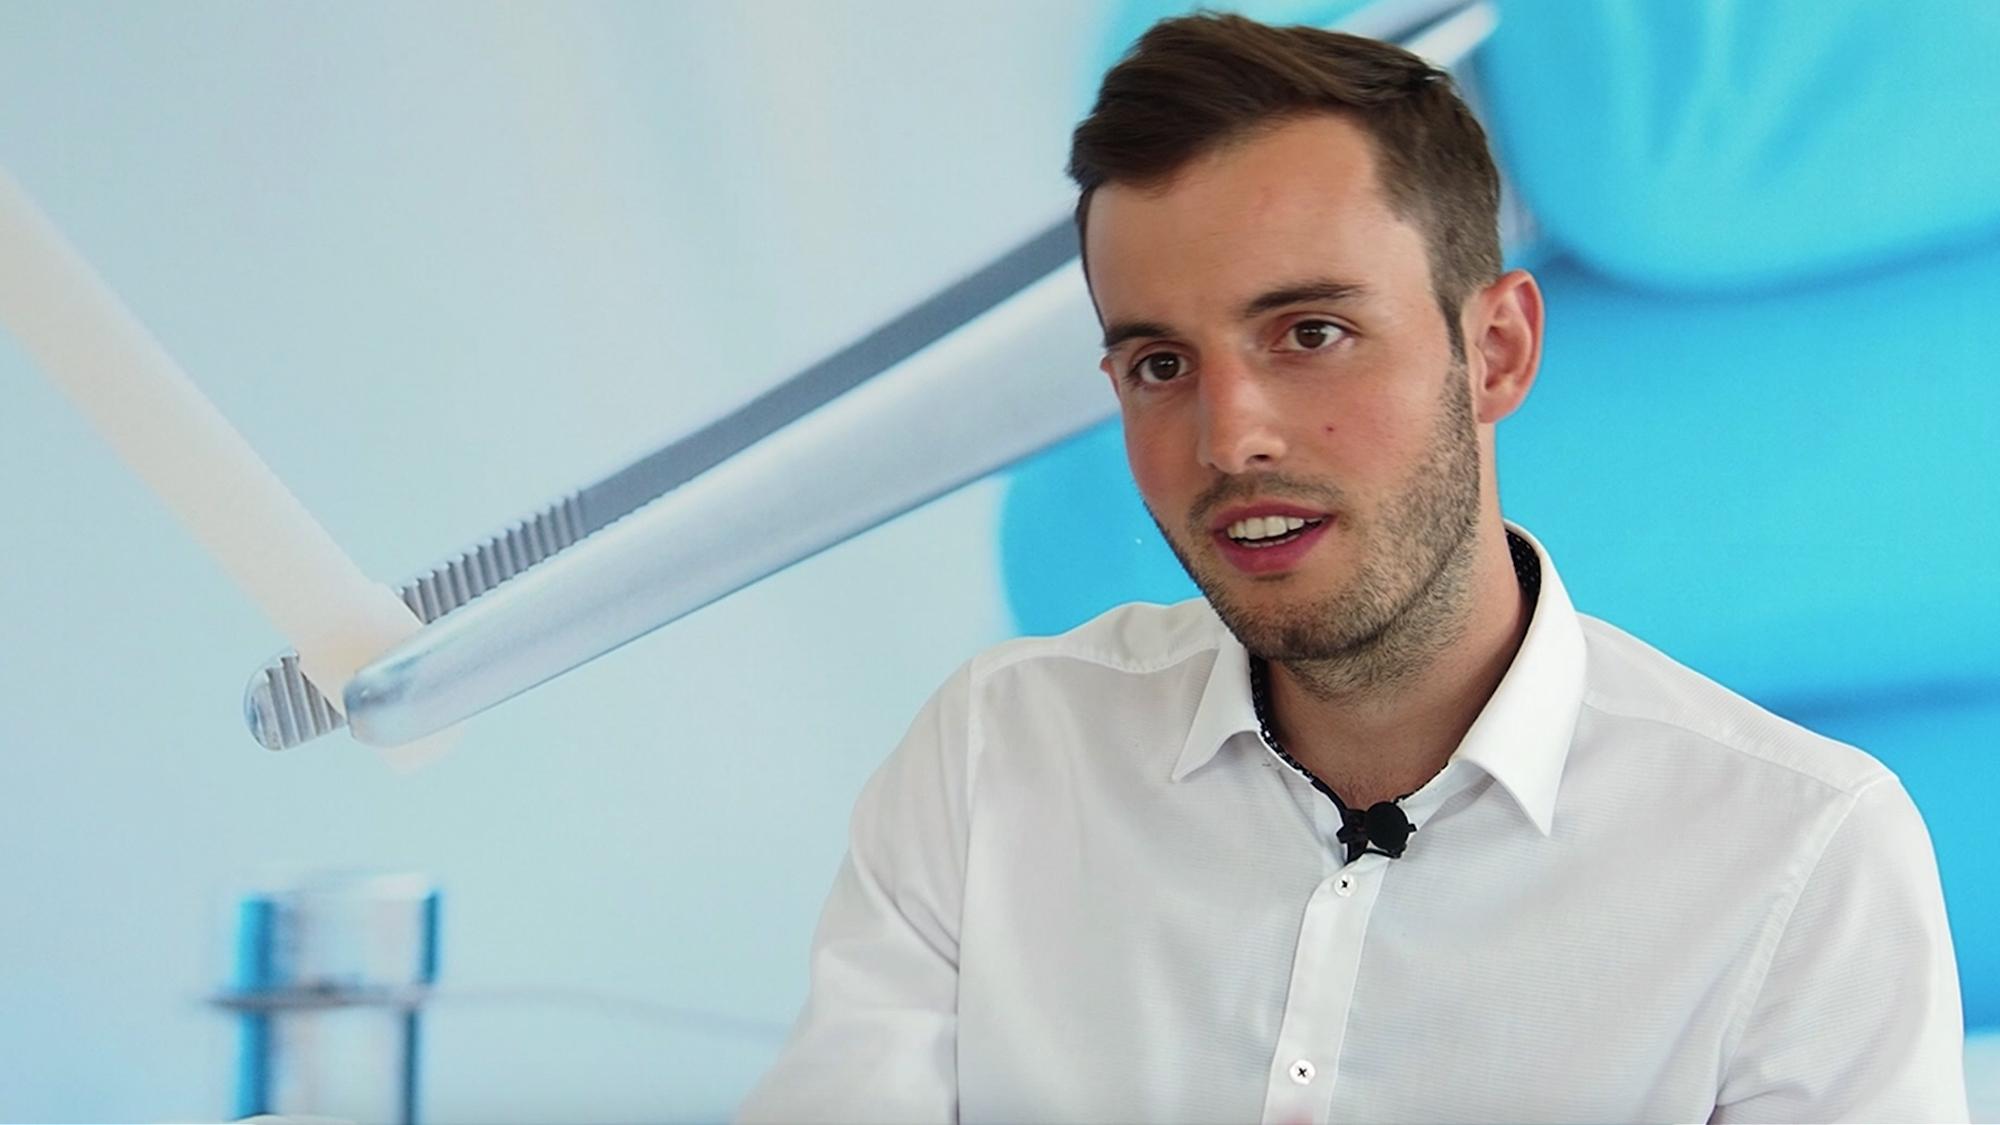 SurgeBright-Co-Geschäftsführer Lukas Pastl. © Trending Topics